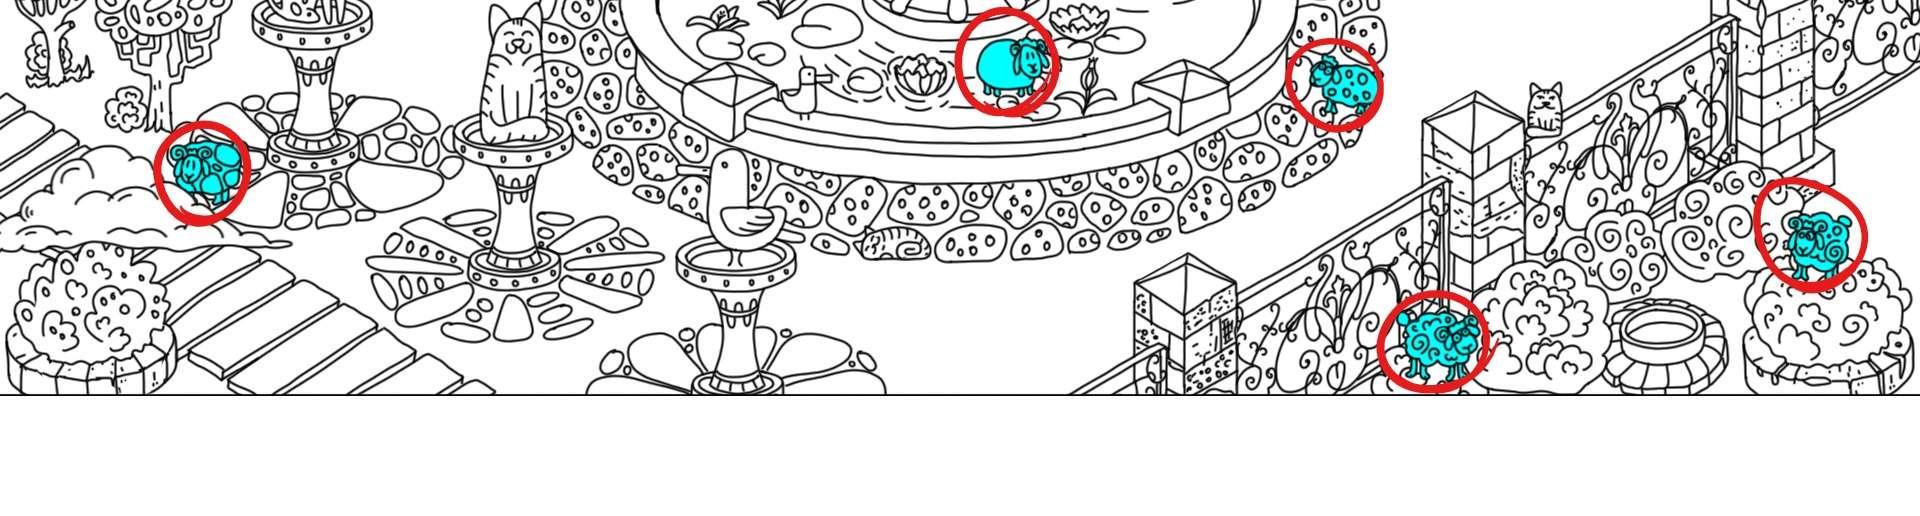 100 hidden rams - All Hidden Ram Location - Map Guide - all rams - B7F5EE4